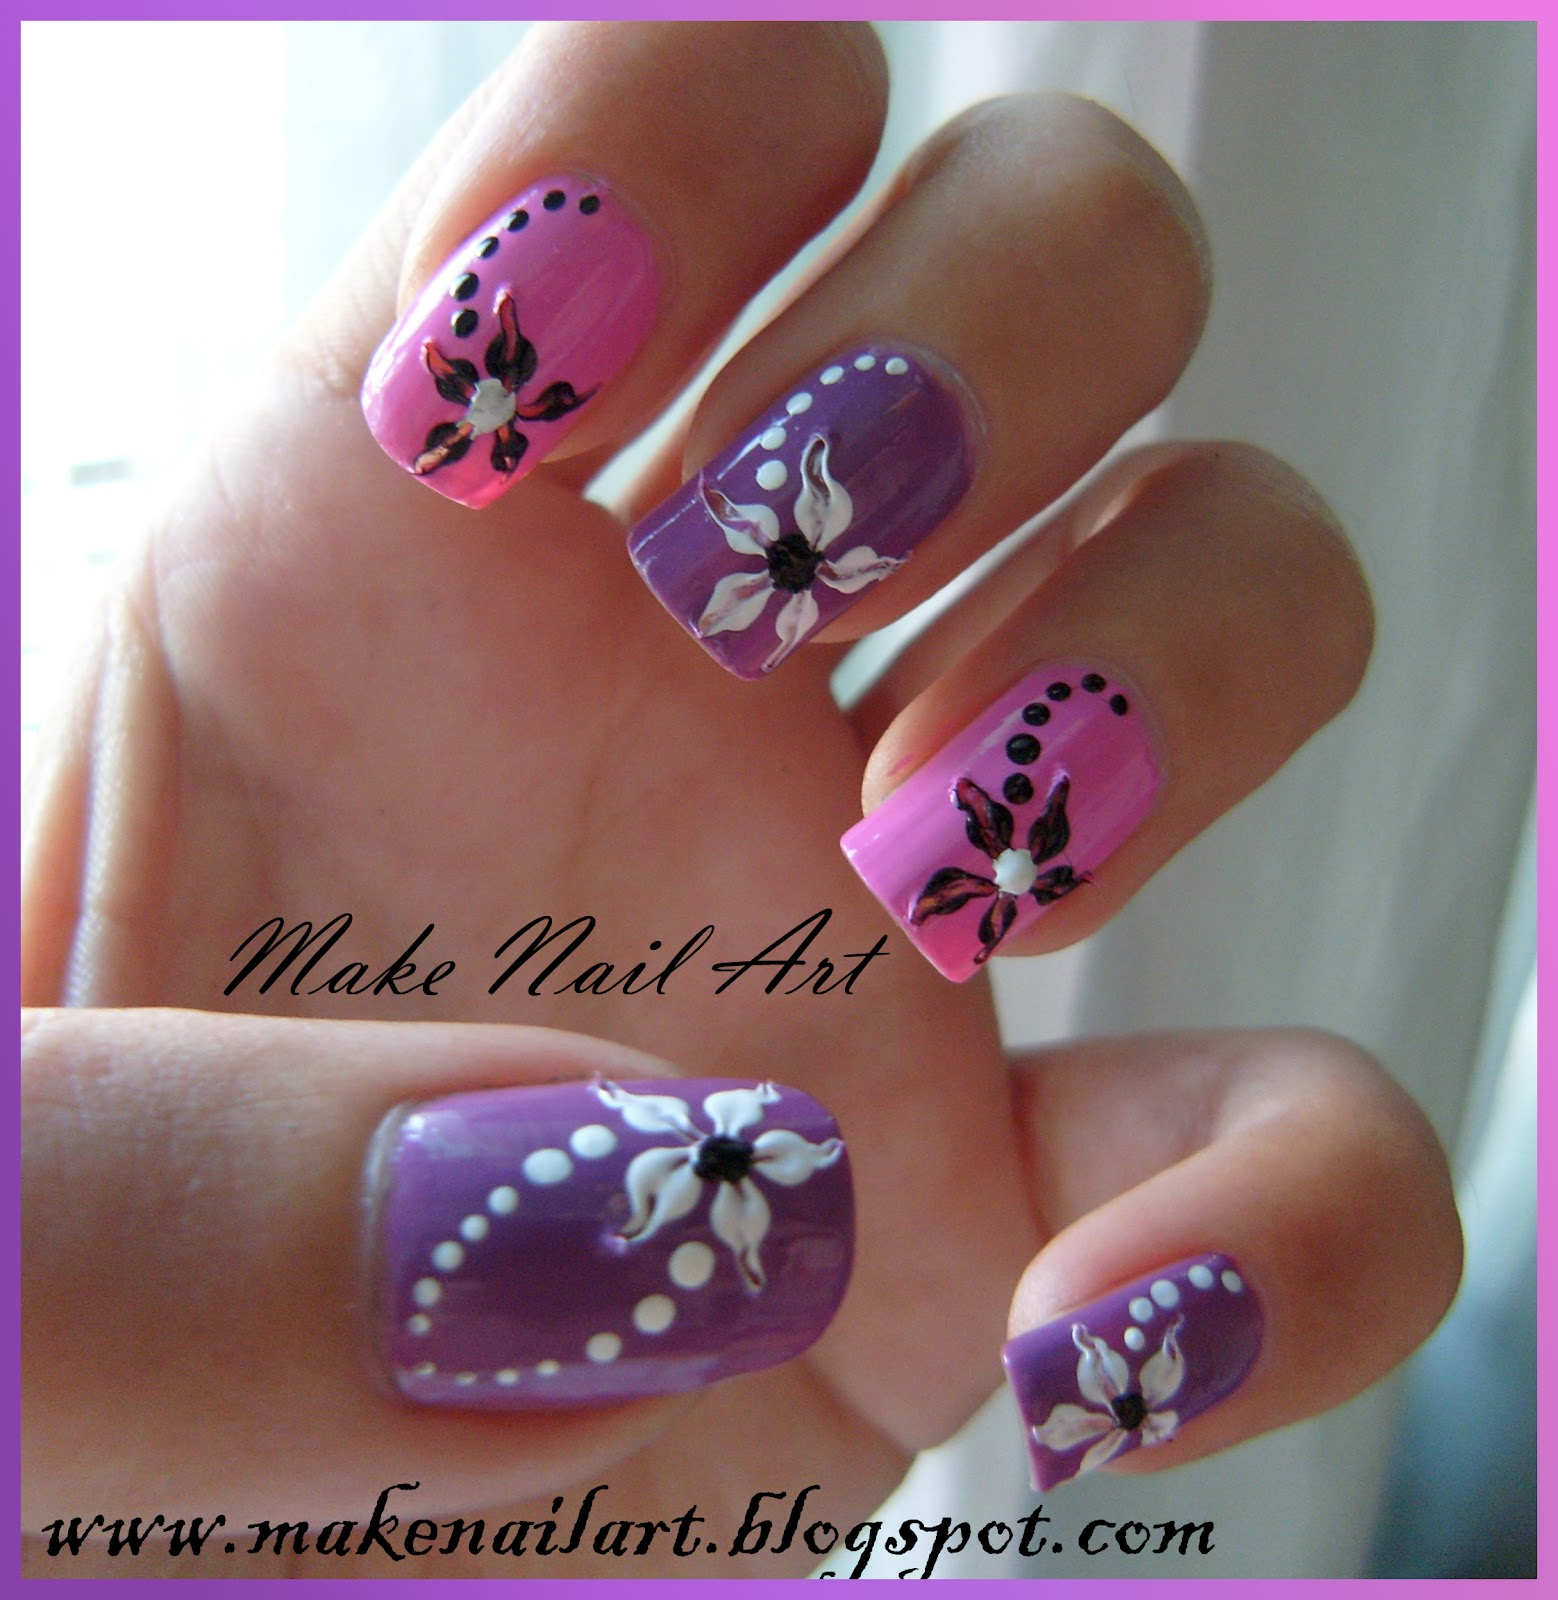 Make Nail Art: Easy And Beautiful Flower Nail Art Tutorial